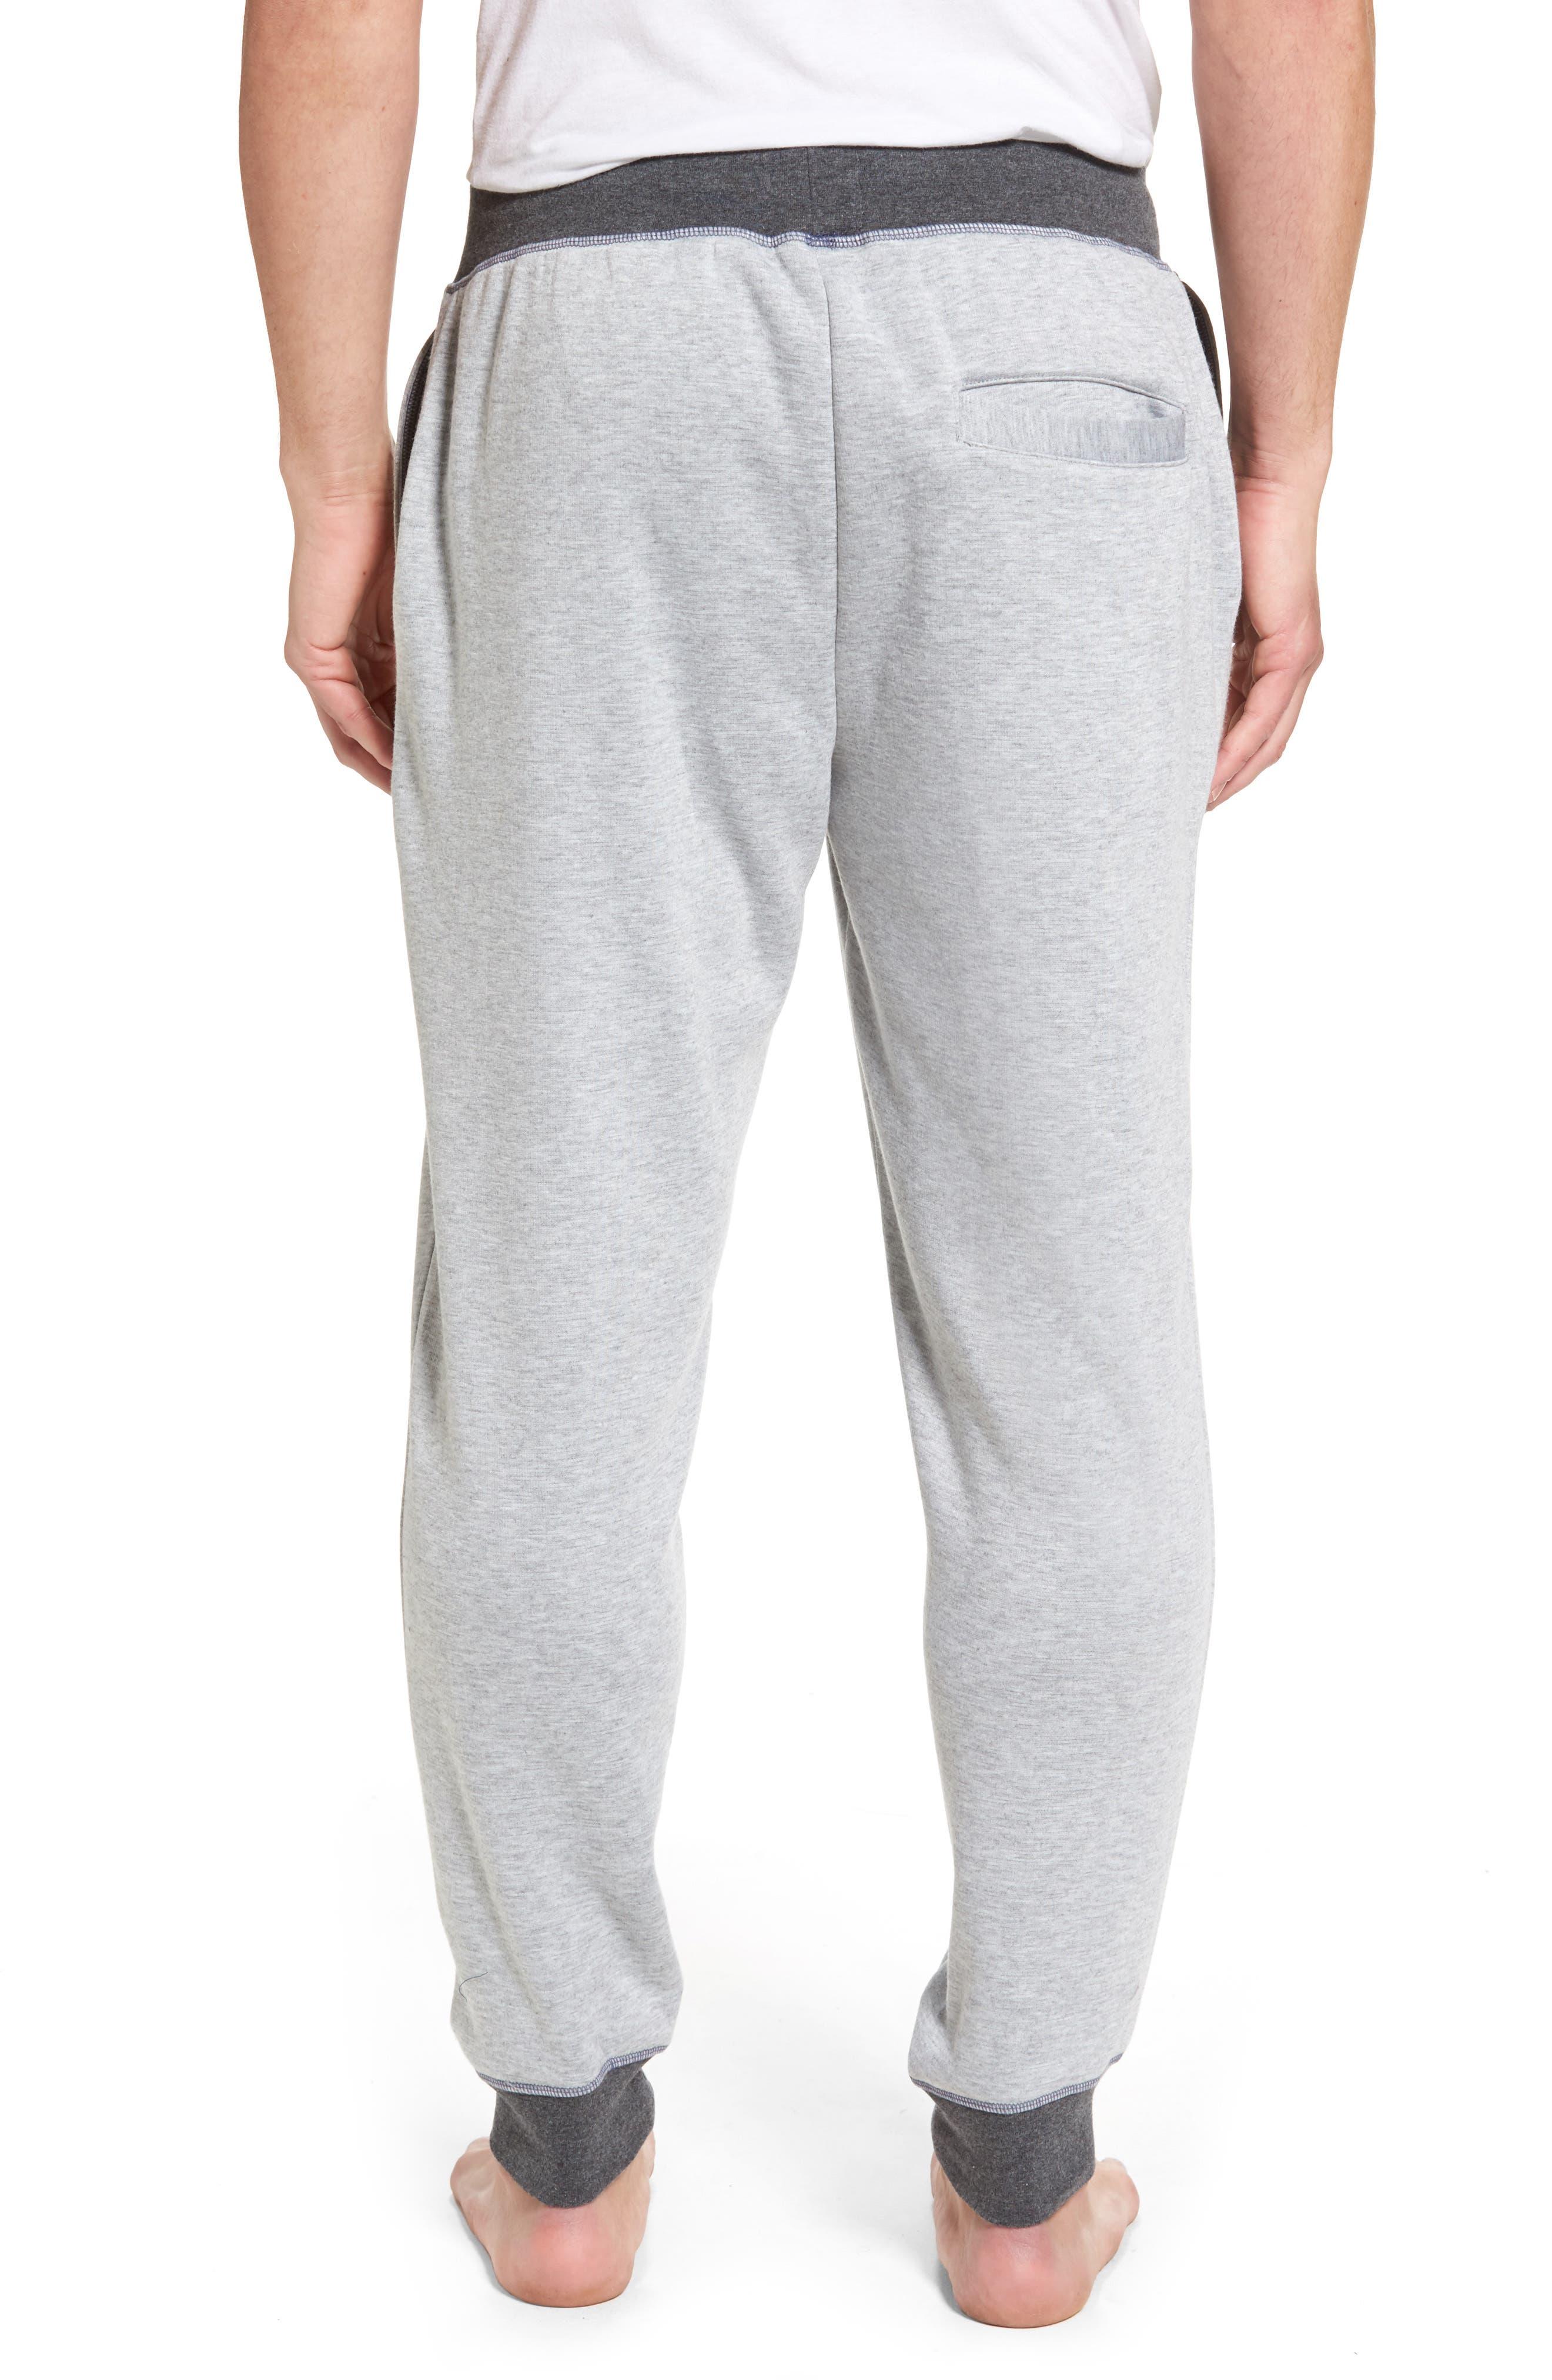 Double Take Knit Lounge Pants,                             Alternate thumbnail 2, color,                             025